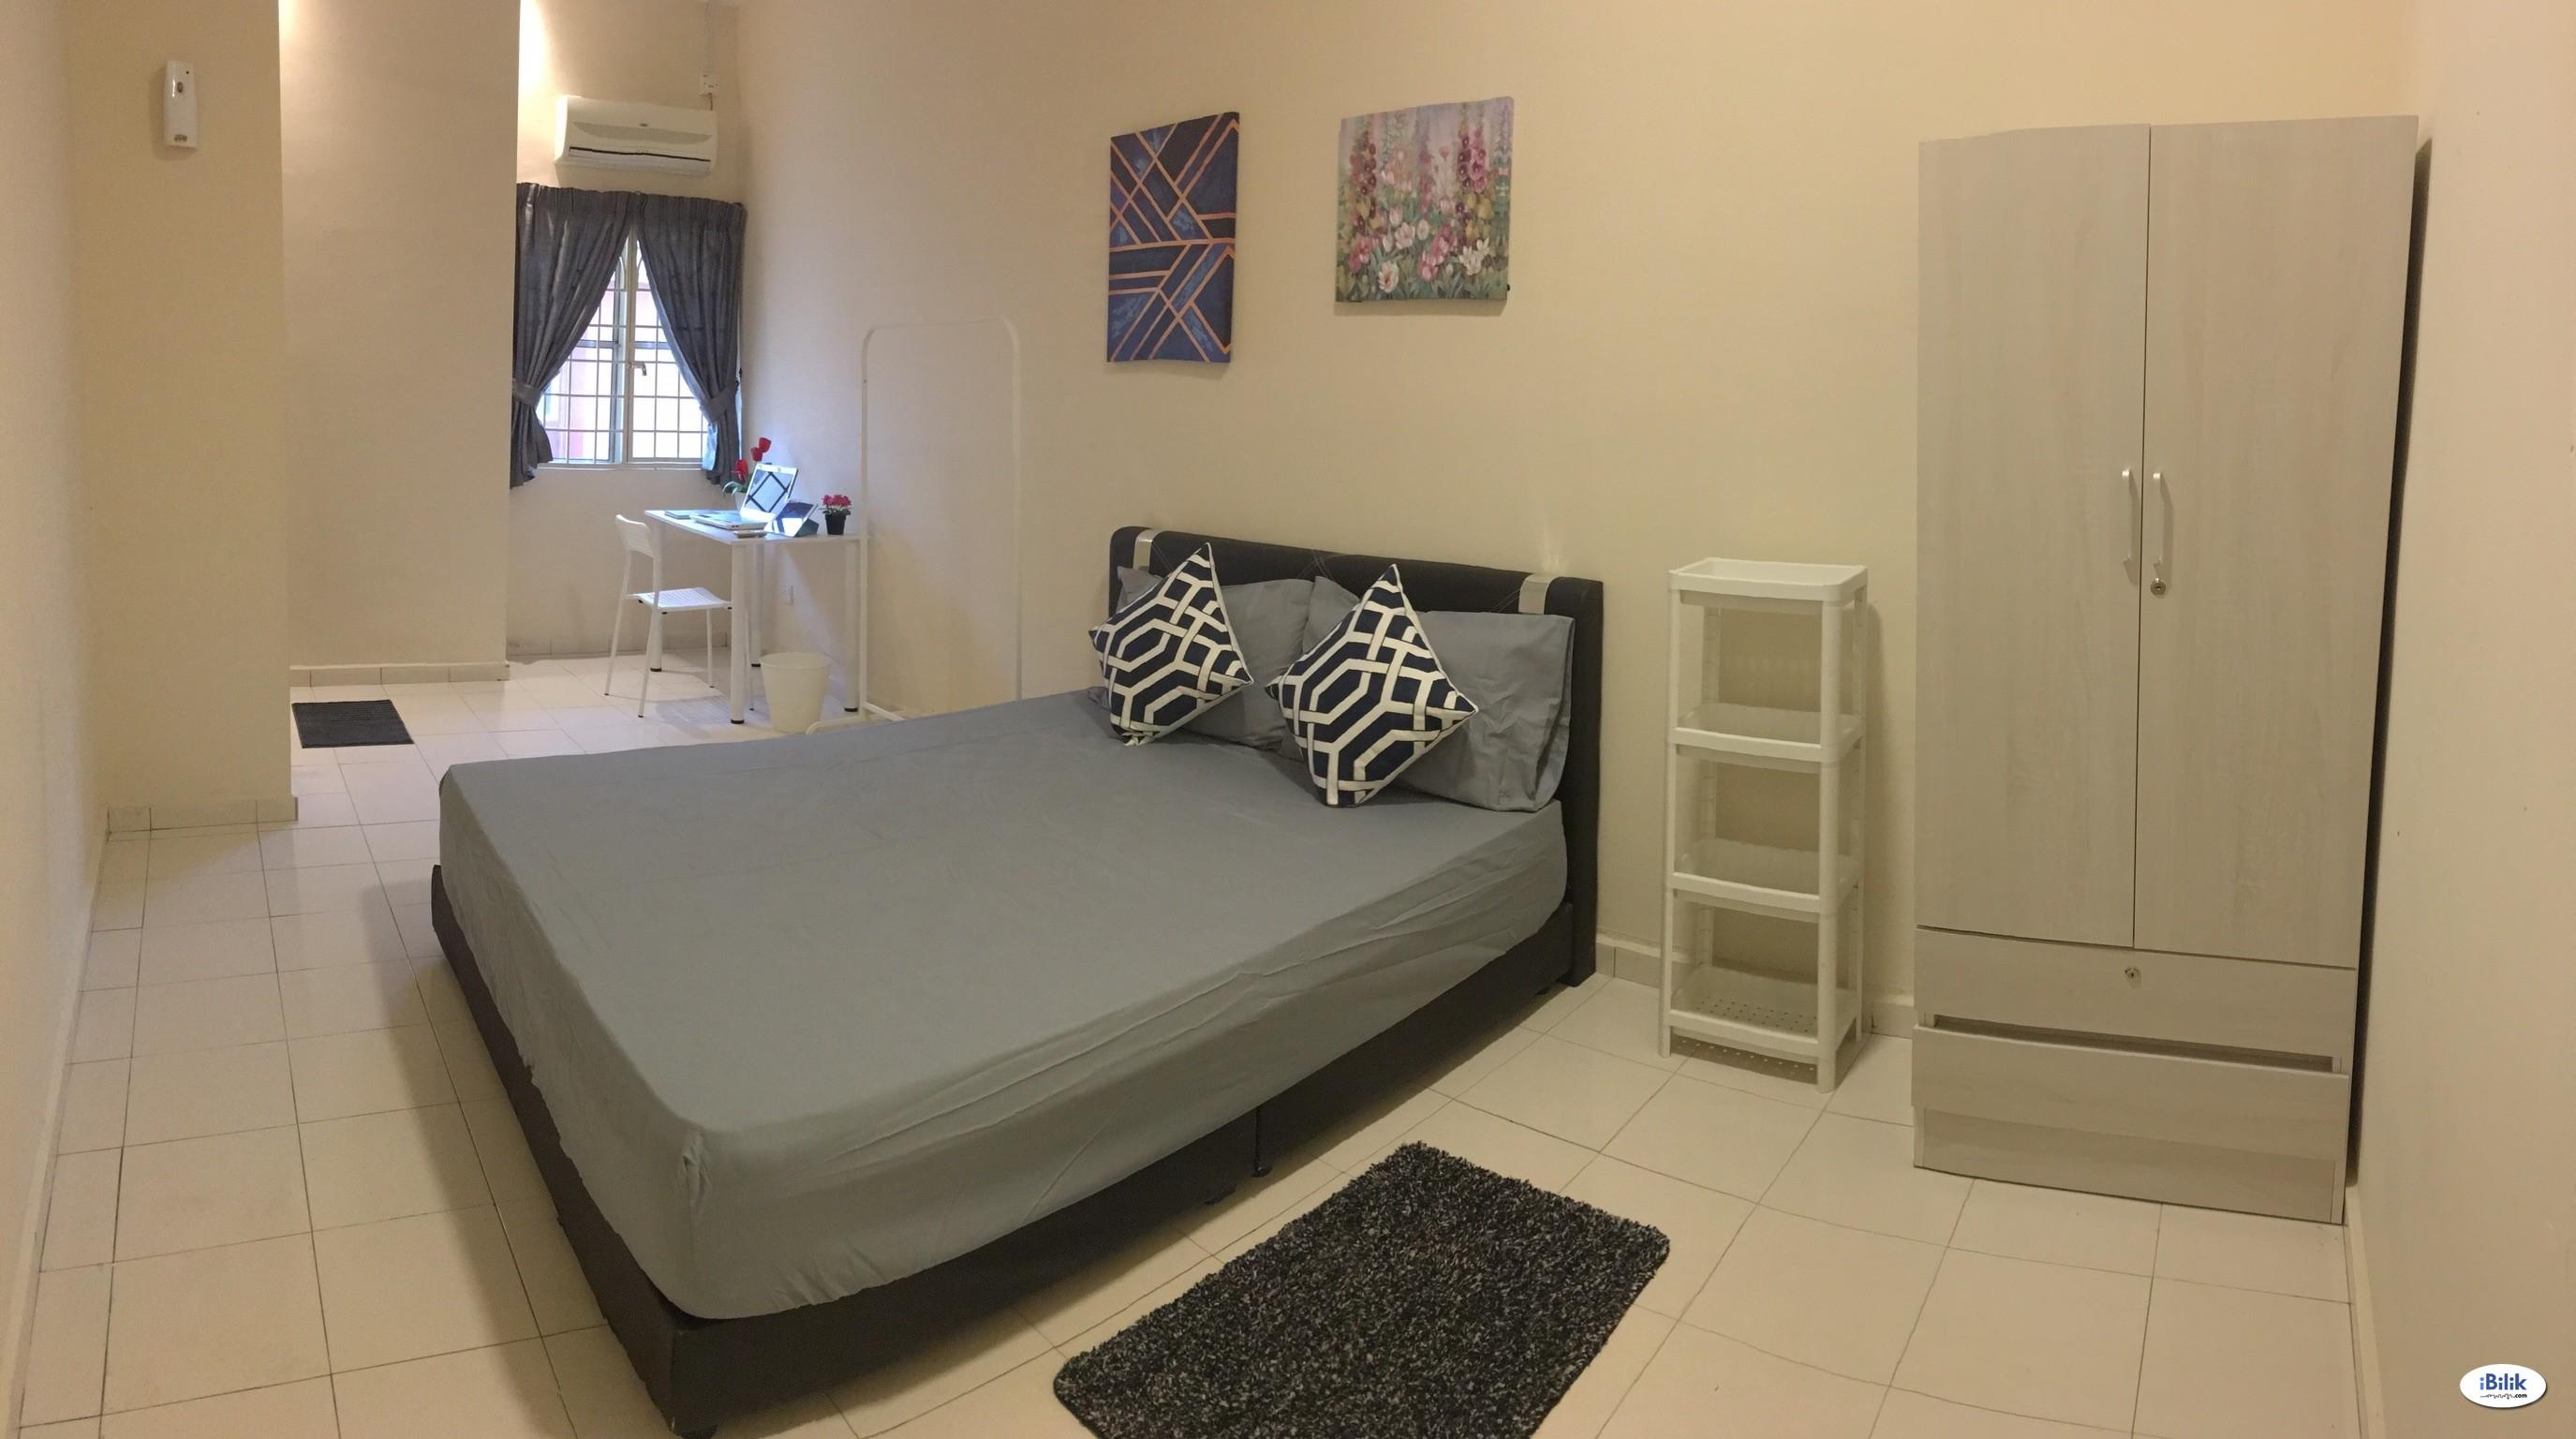 Middle Room at Seremban, Negeri Sembilan